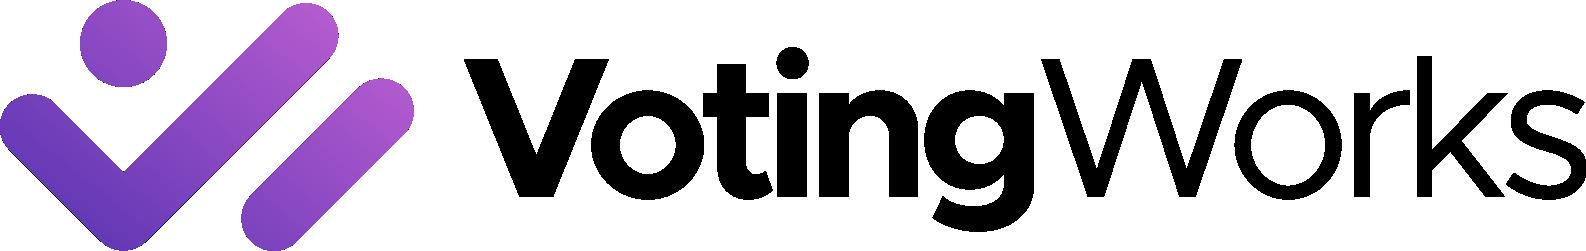 VotingWorks logo